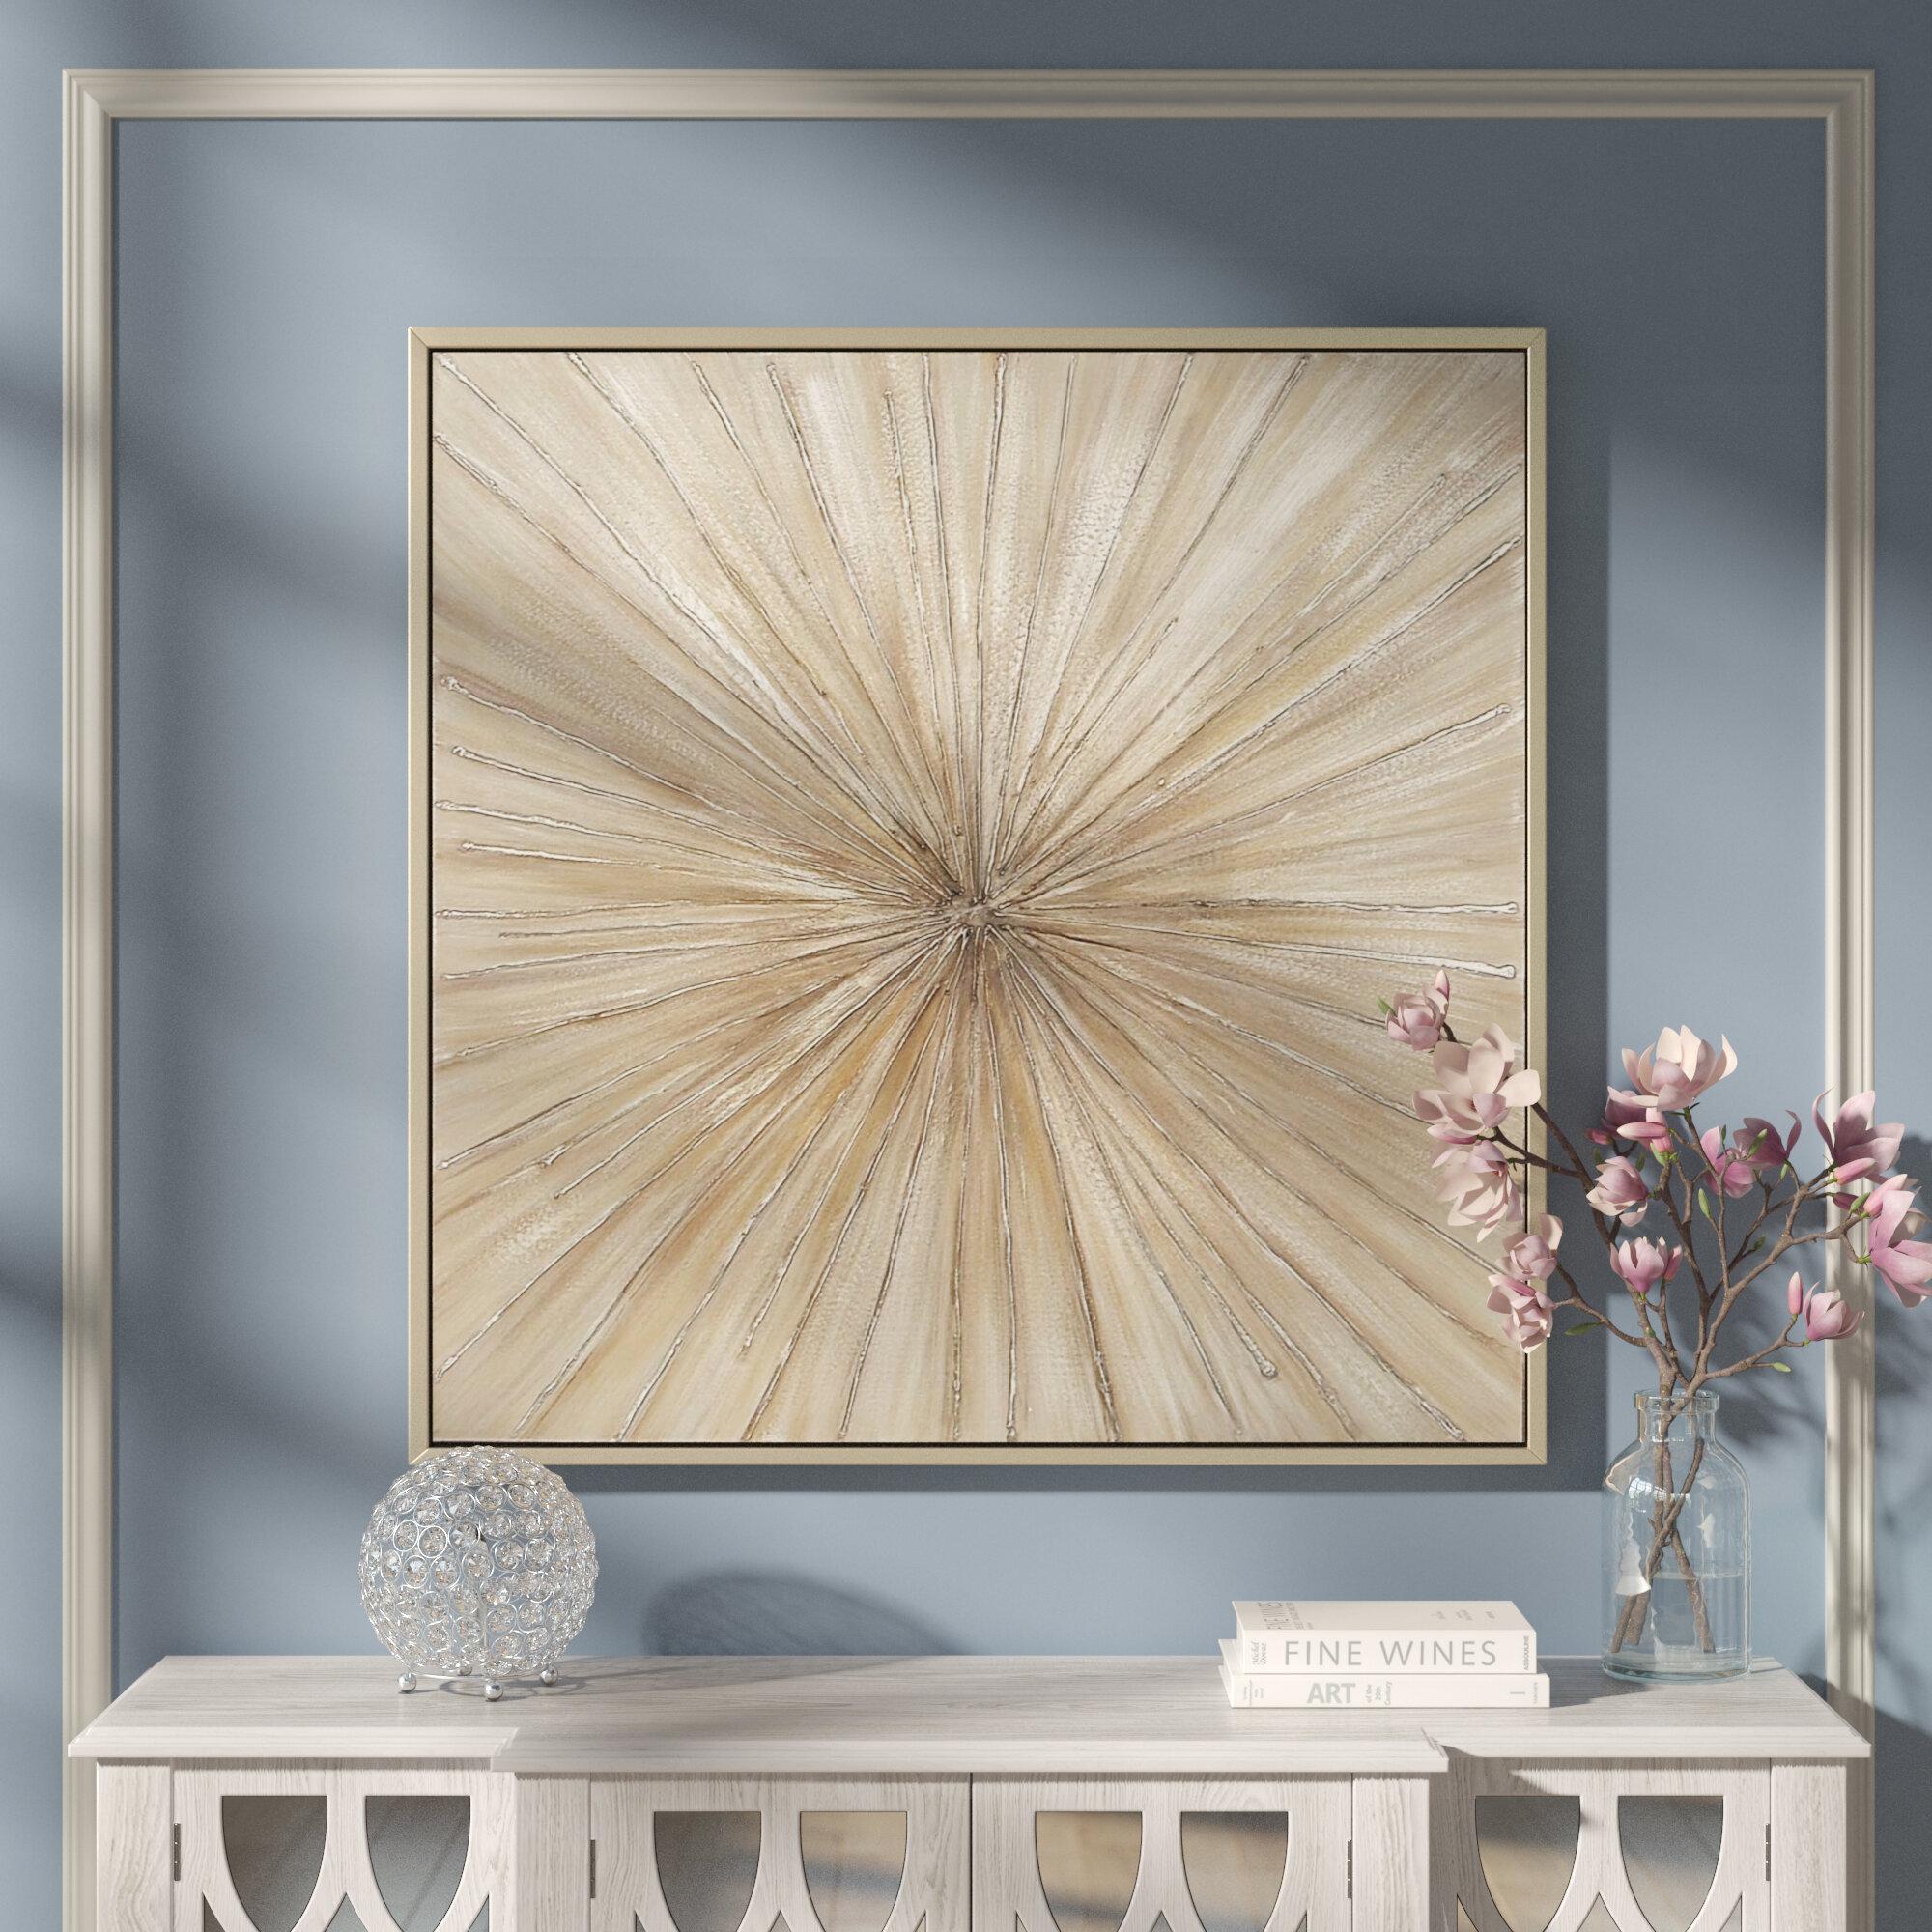 Greyleigh Contemporary Bursting Framed Graphic Art Print On Canvas Reviews Wayfair